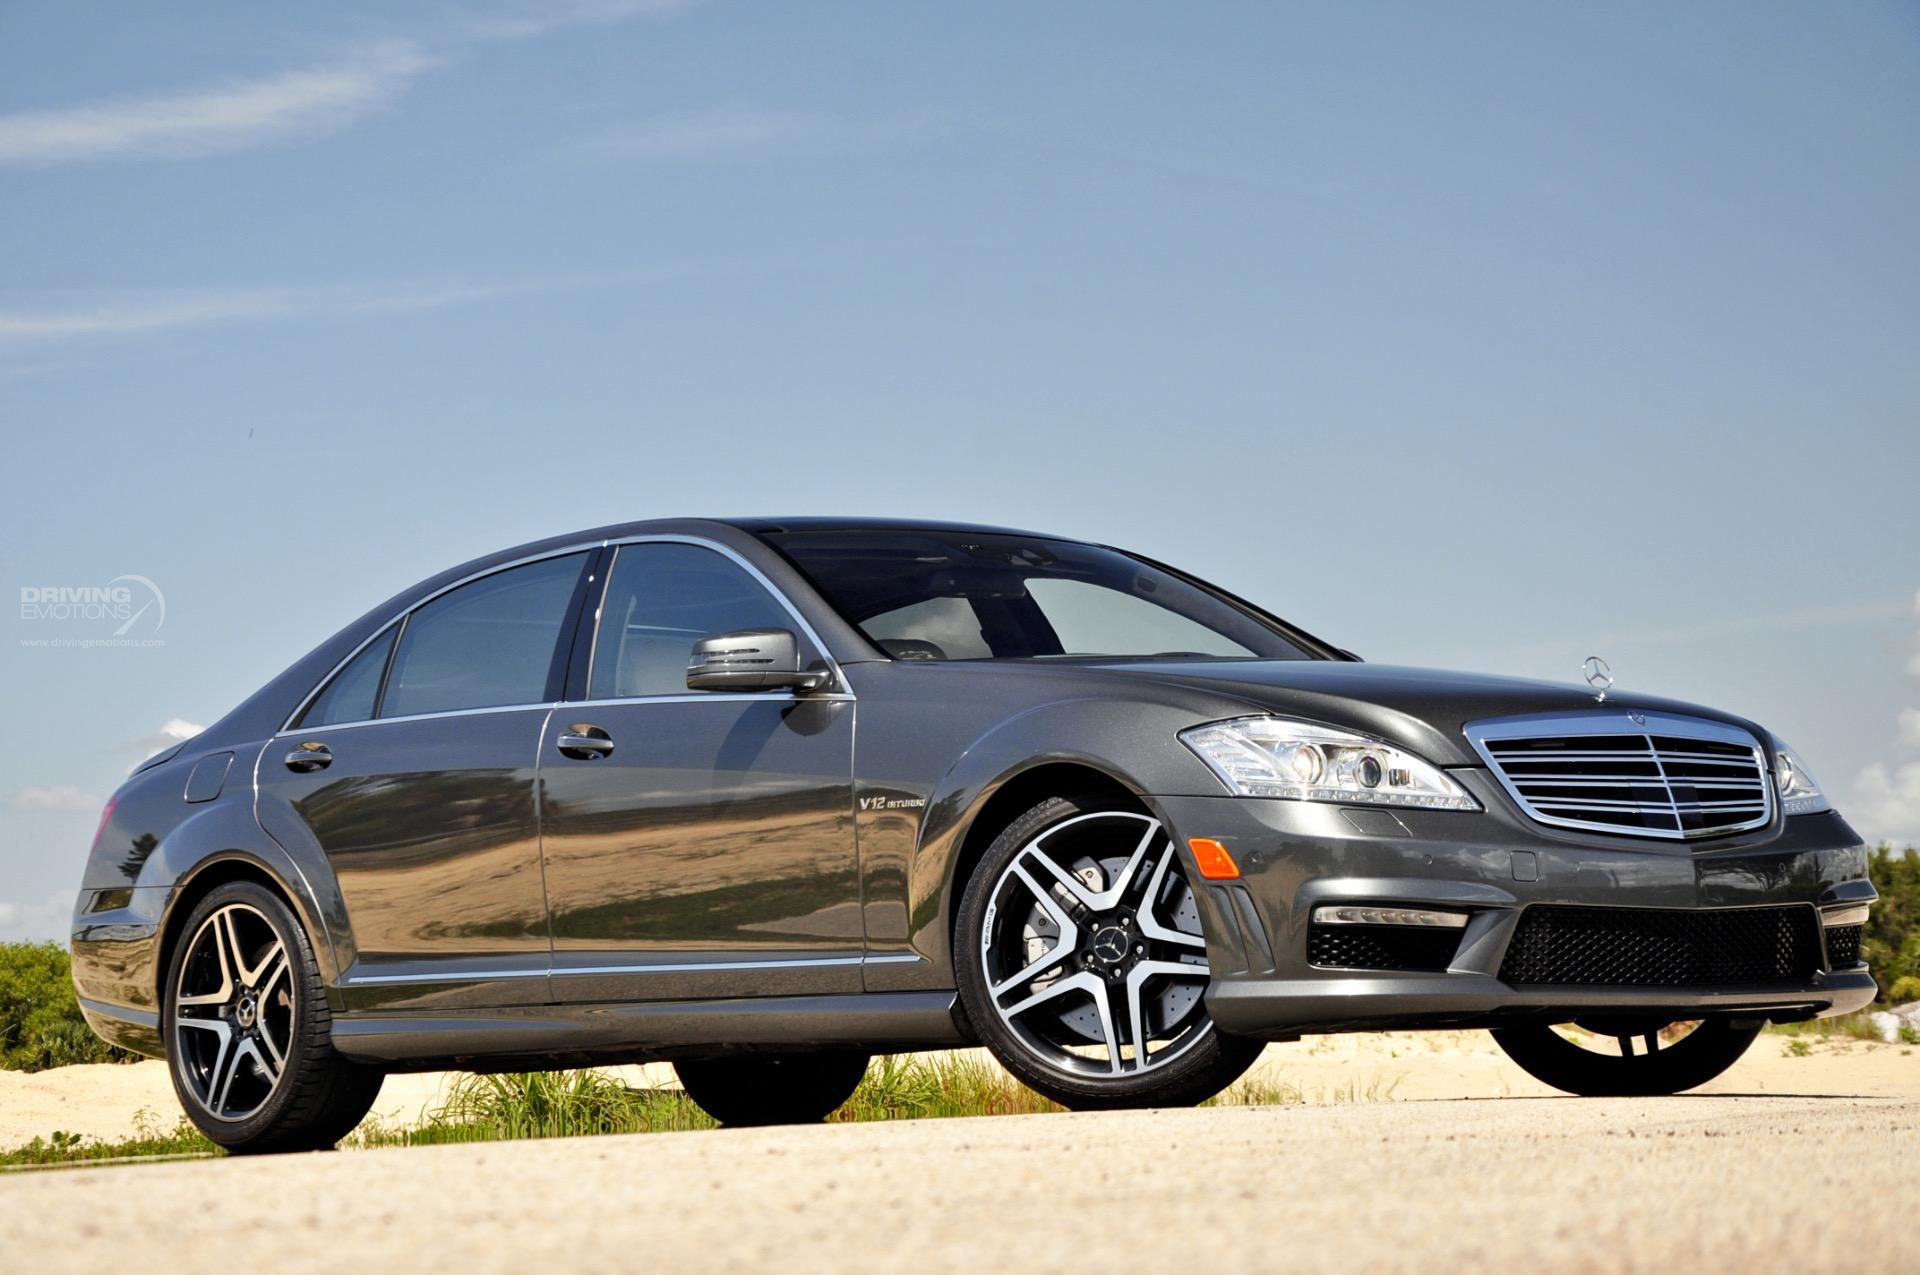 2012 mercedes benz s65 amg 65 amg v12 bi turbo stock for Mercedes benz s65 amg v12 biturbo